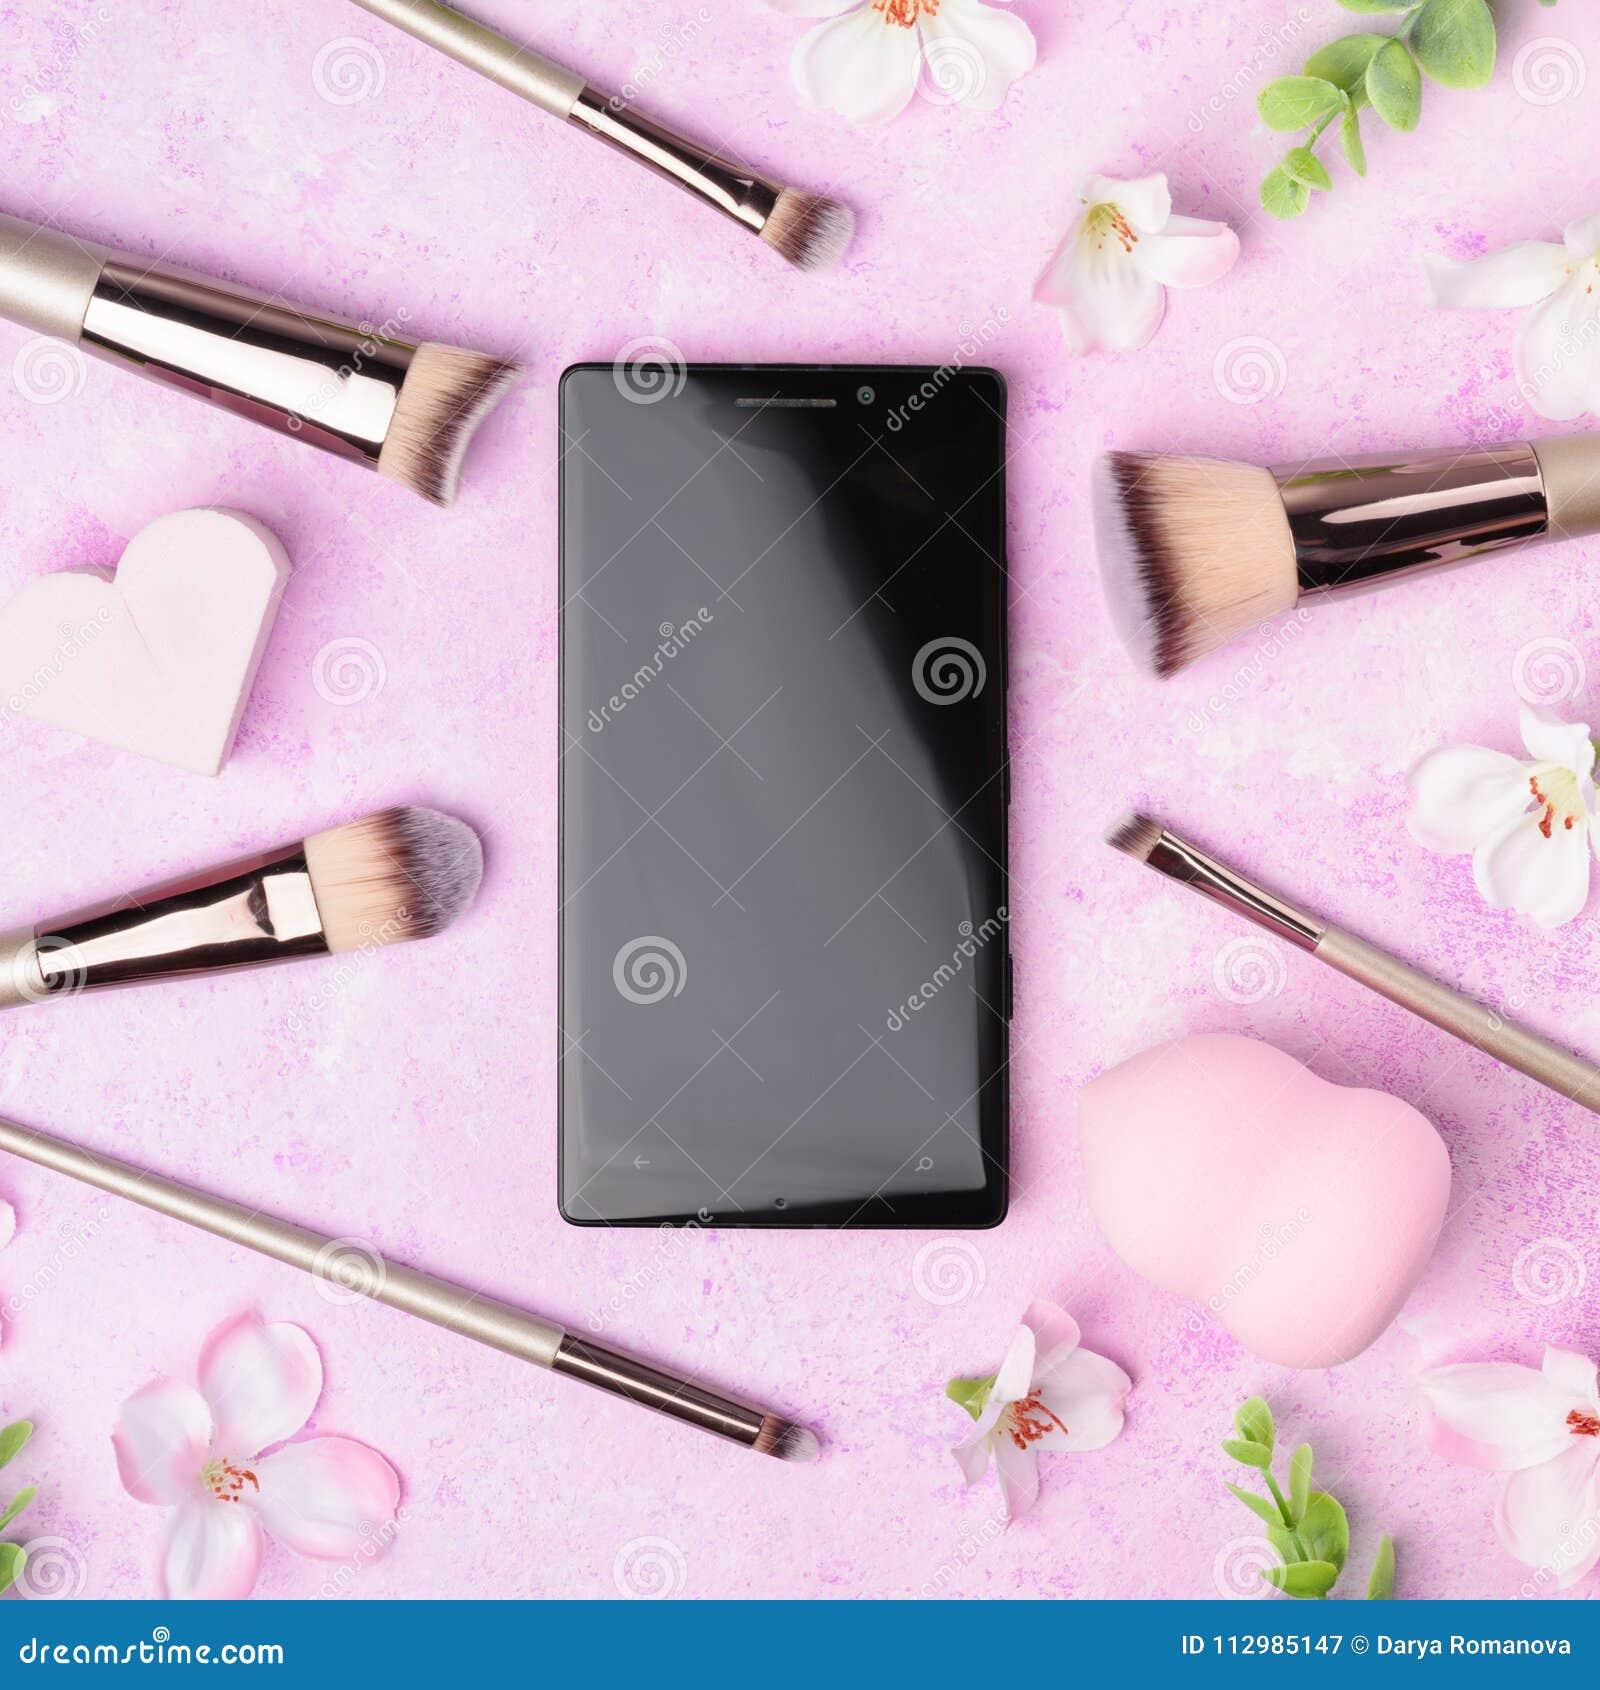 Set of makeup brushes on pink background.